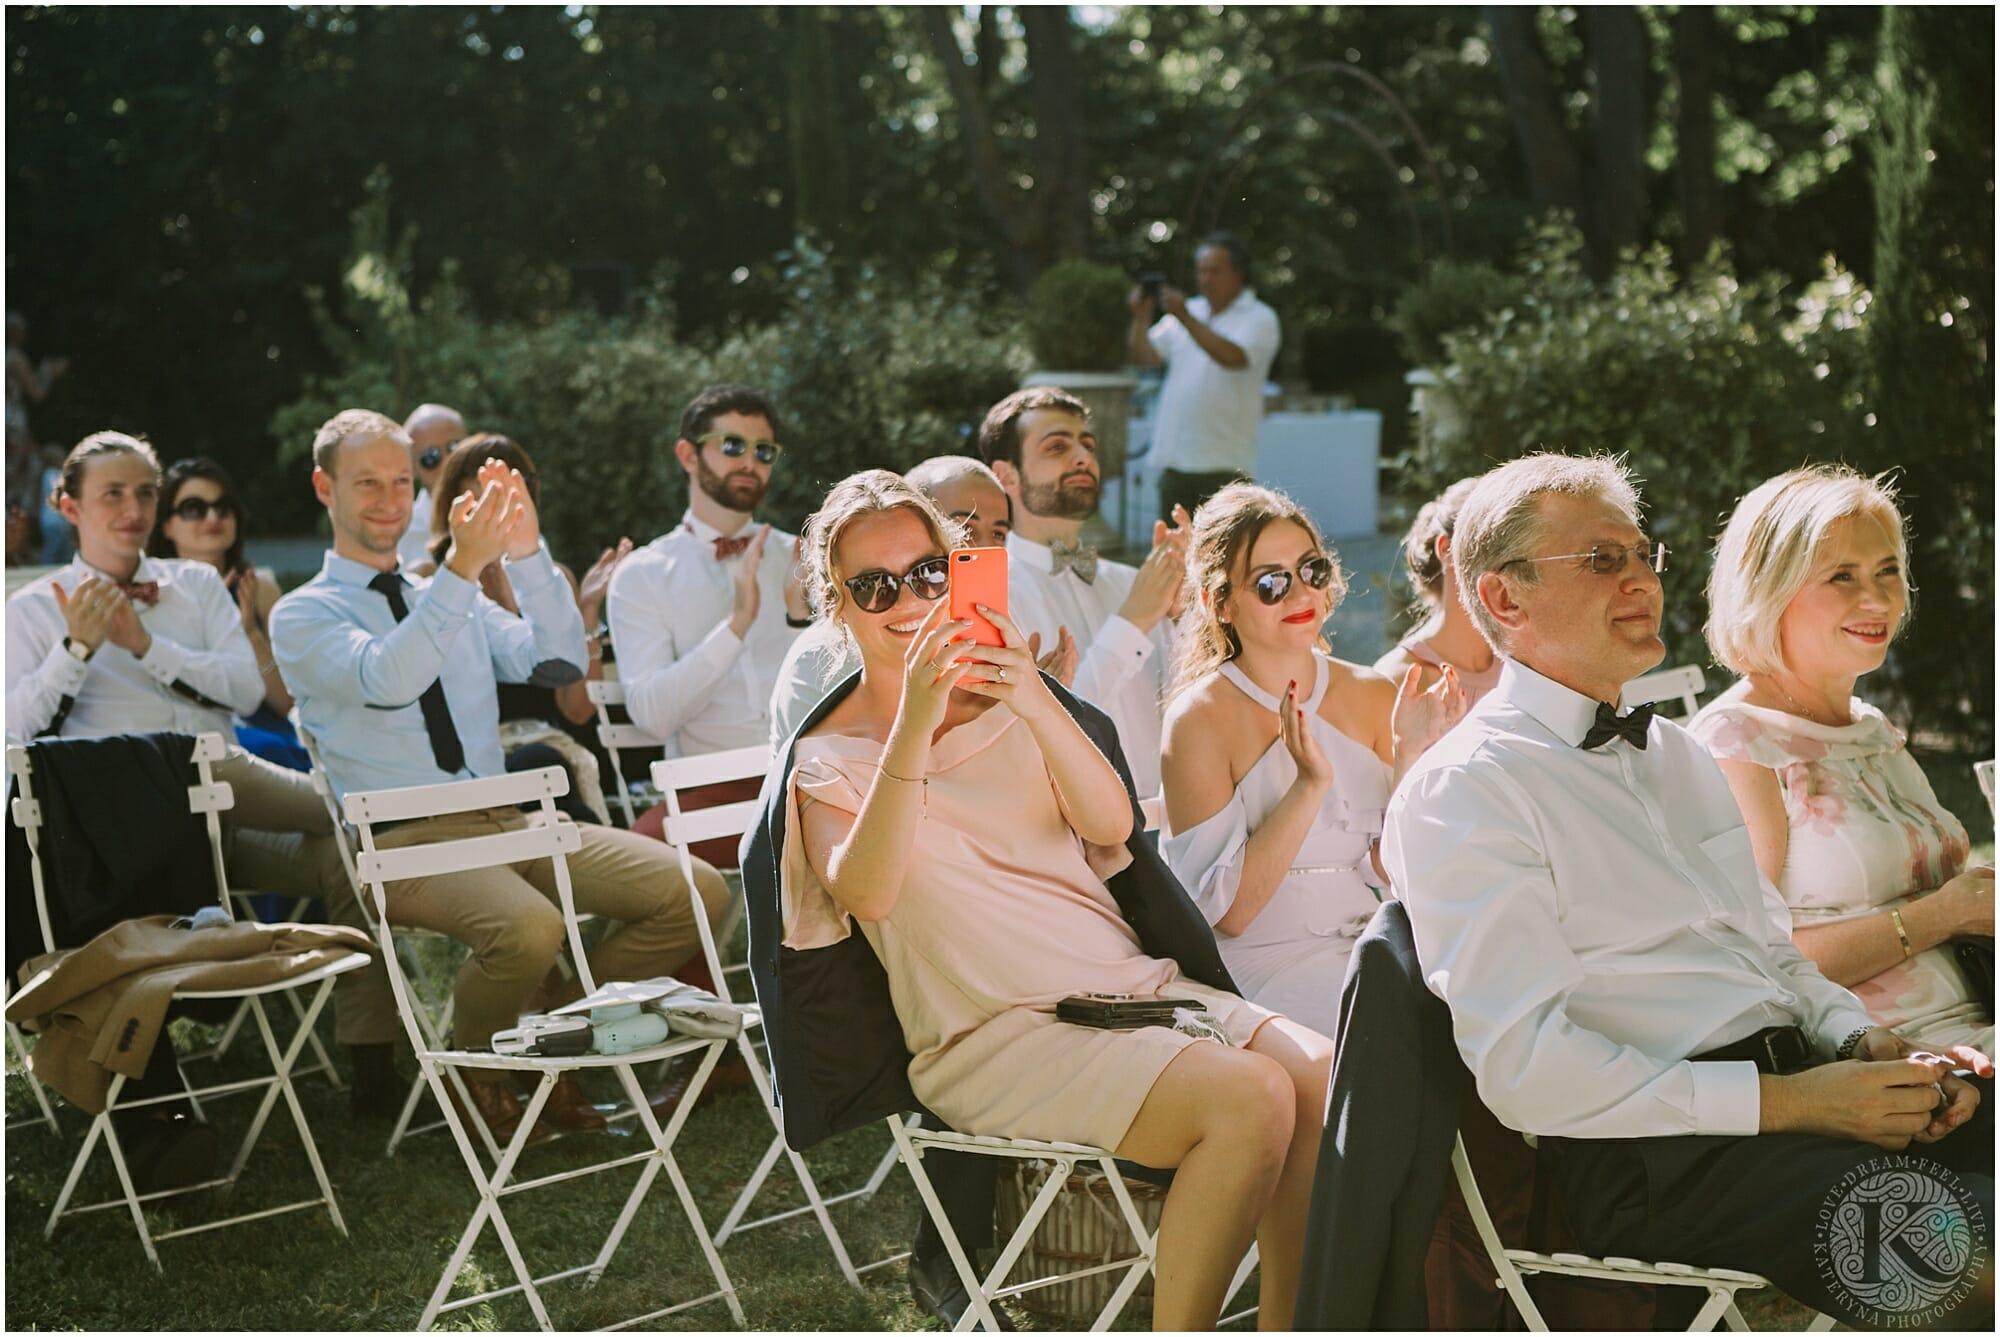 Kateryna-photos-photographe-mariage-chateau-des-3-fontaines-provence-avignon-vaucluse-sud_0050.jpg